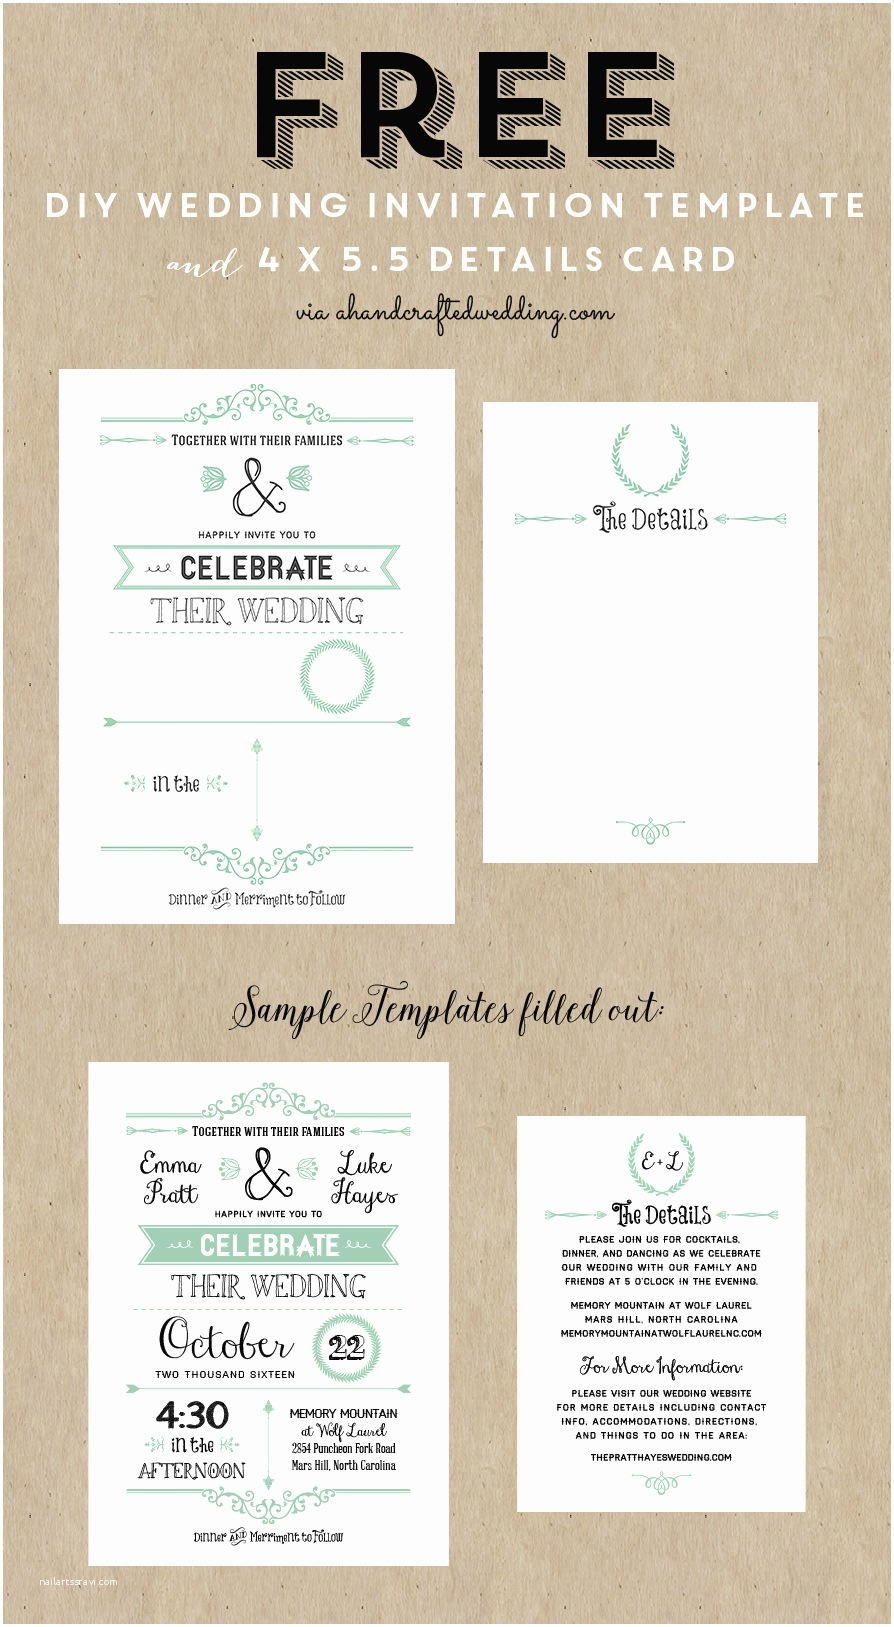 Make Yourself Wedding Invitations Do It Yourself Wedding Invitations Templates